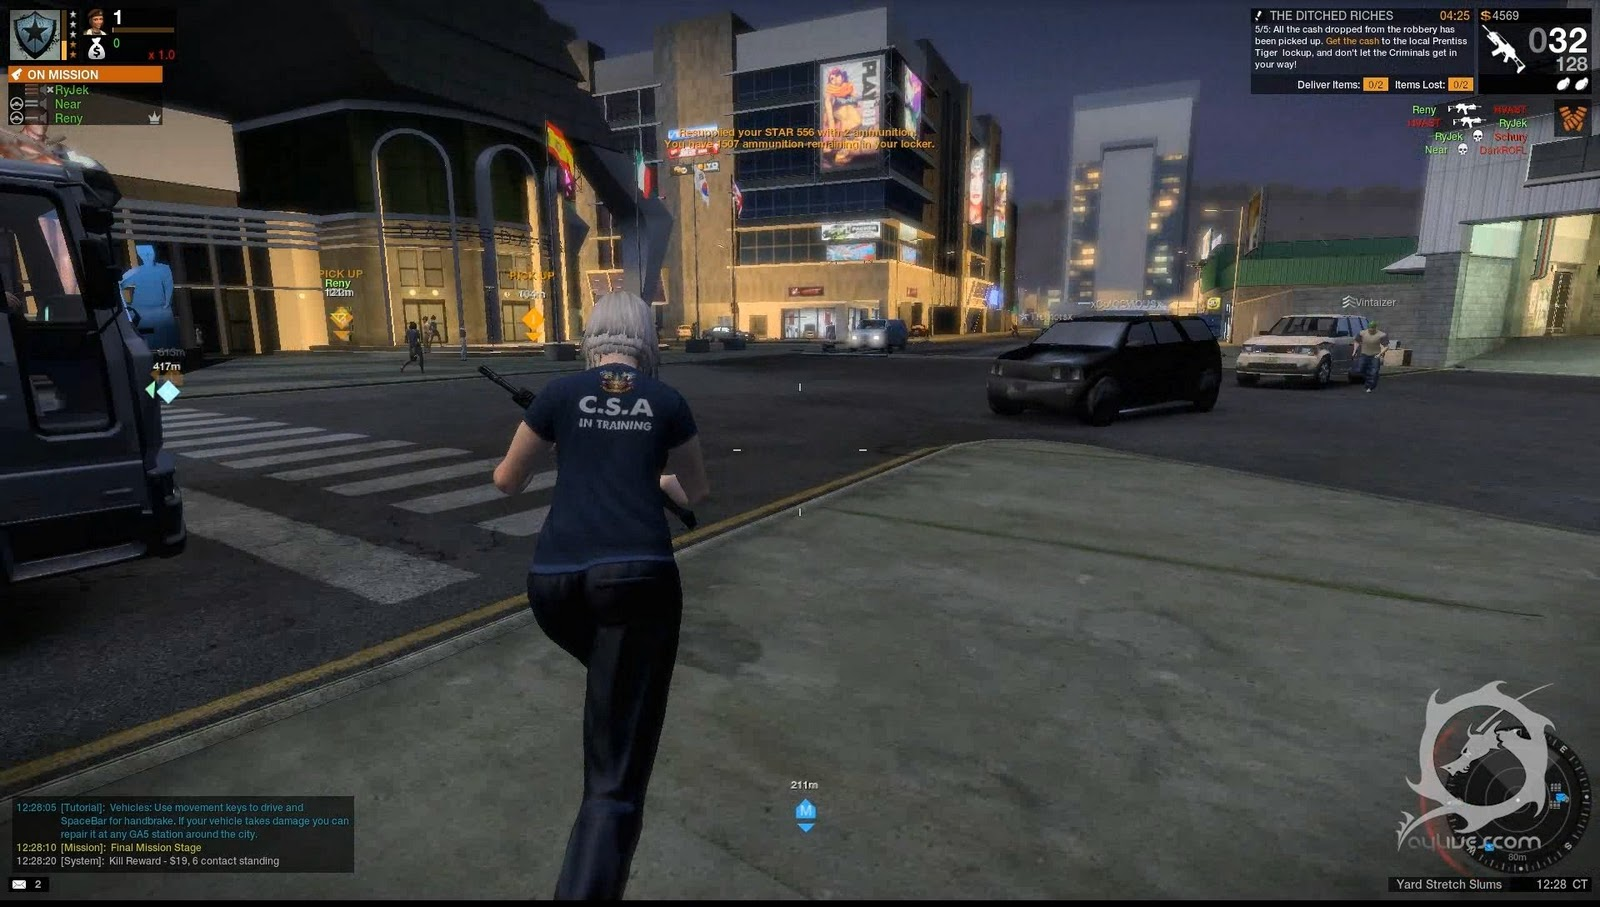 gta 5 free online game play